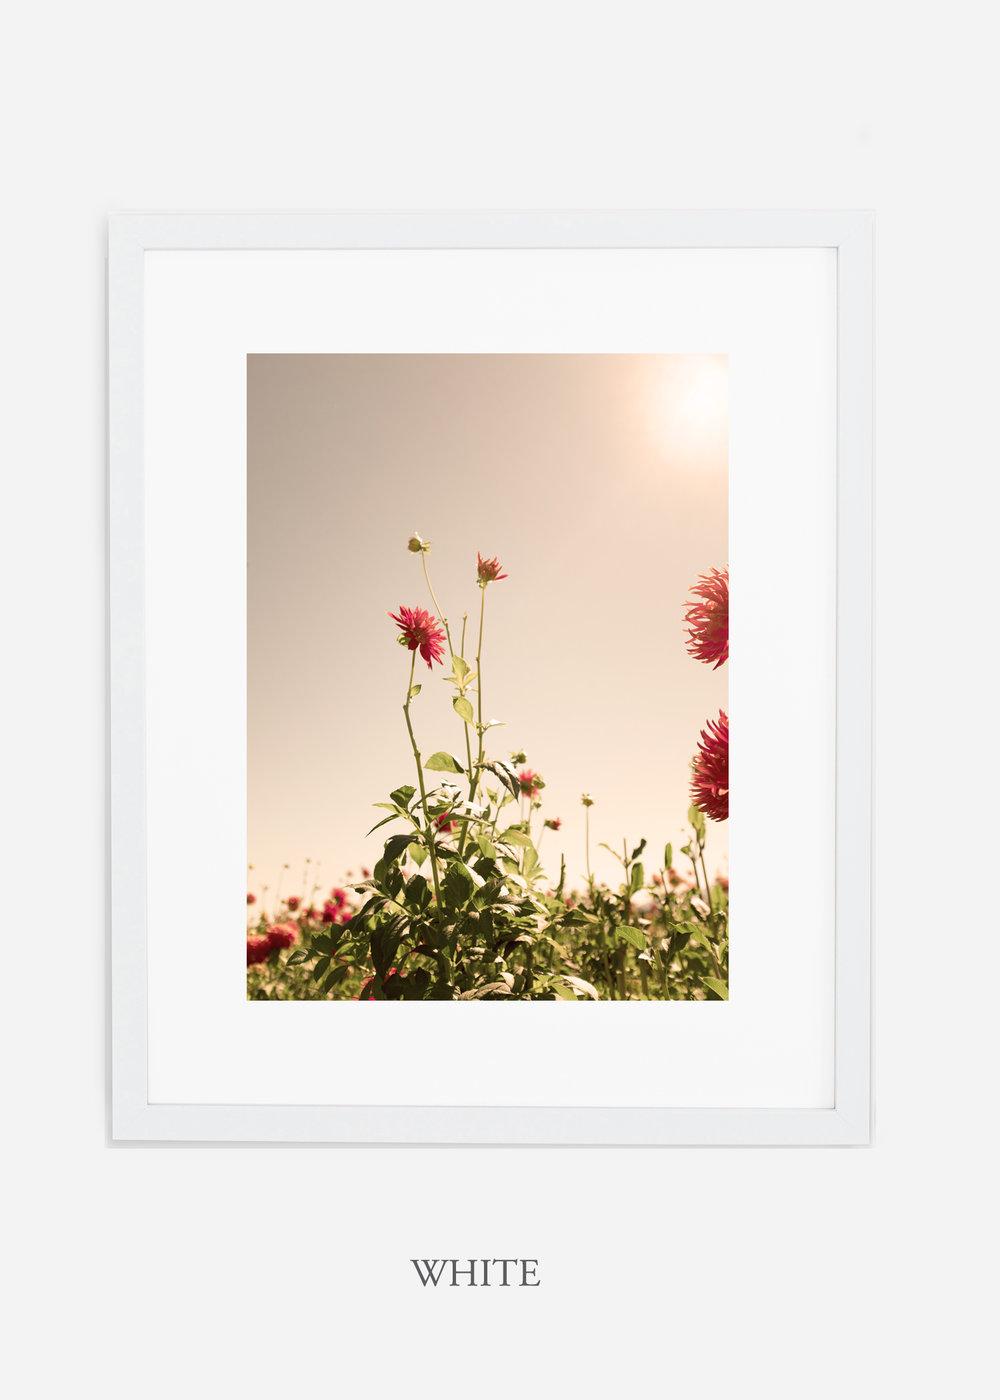 DahliaNo.2_whiteframe__mat_interiordesign_botanicalprint_art.jpg